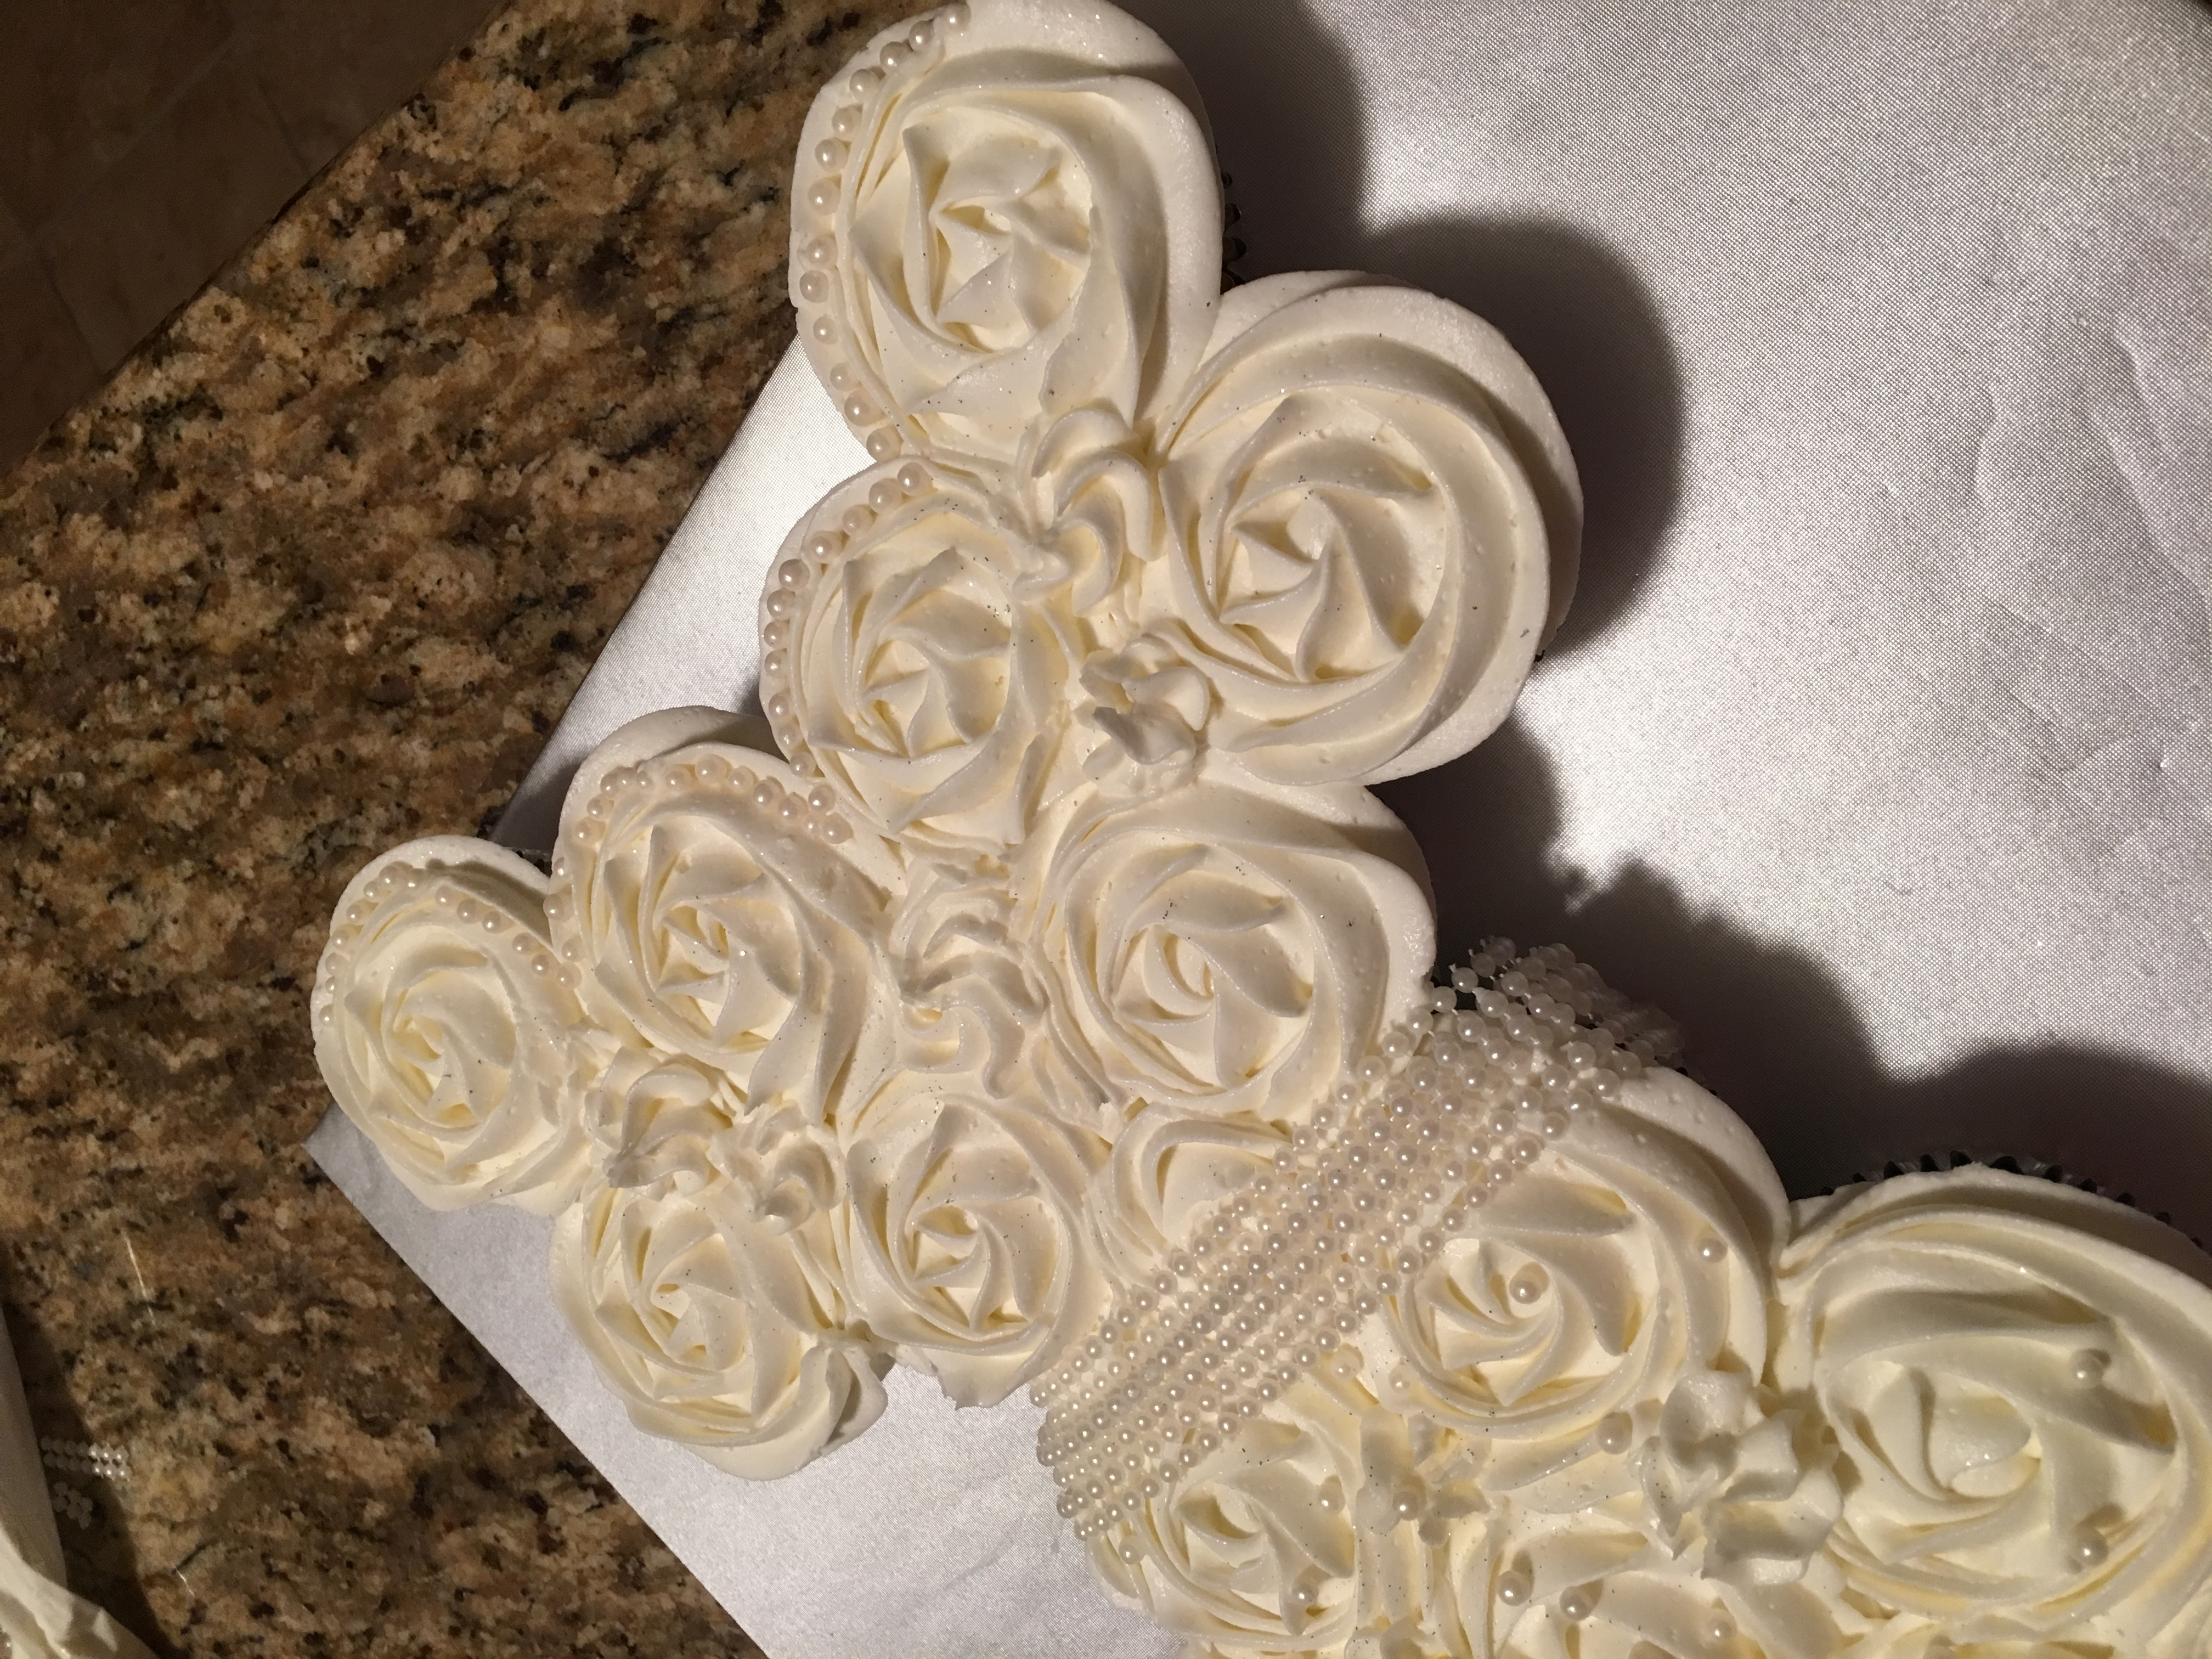 Wedding Dress (30cc) 2